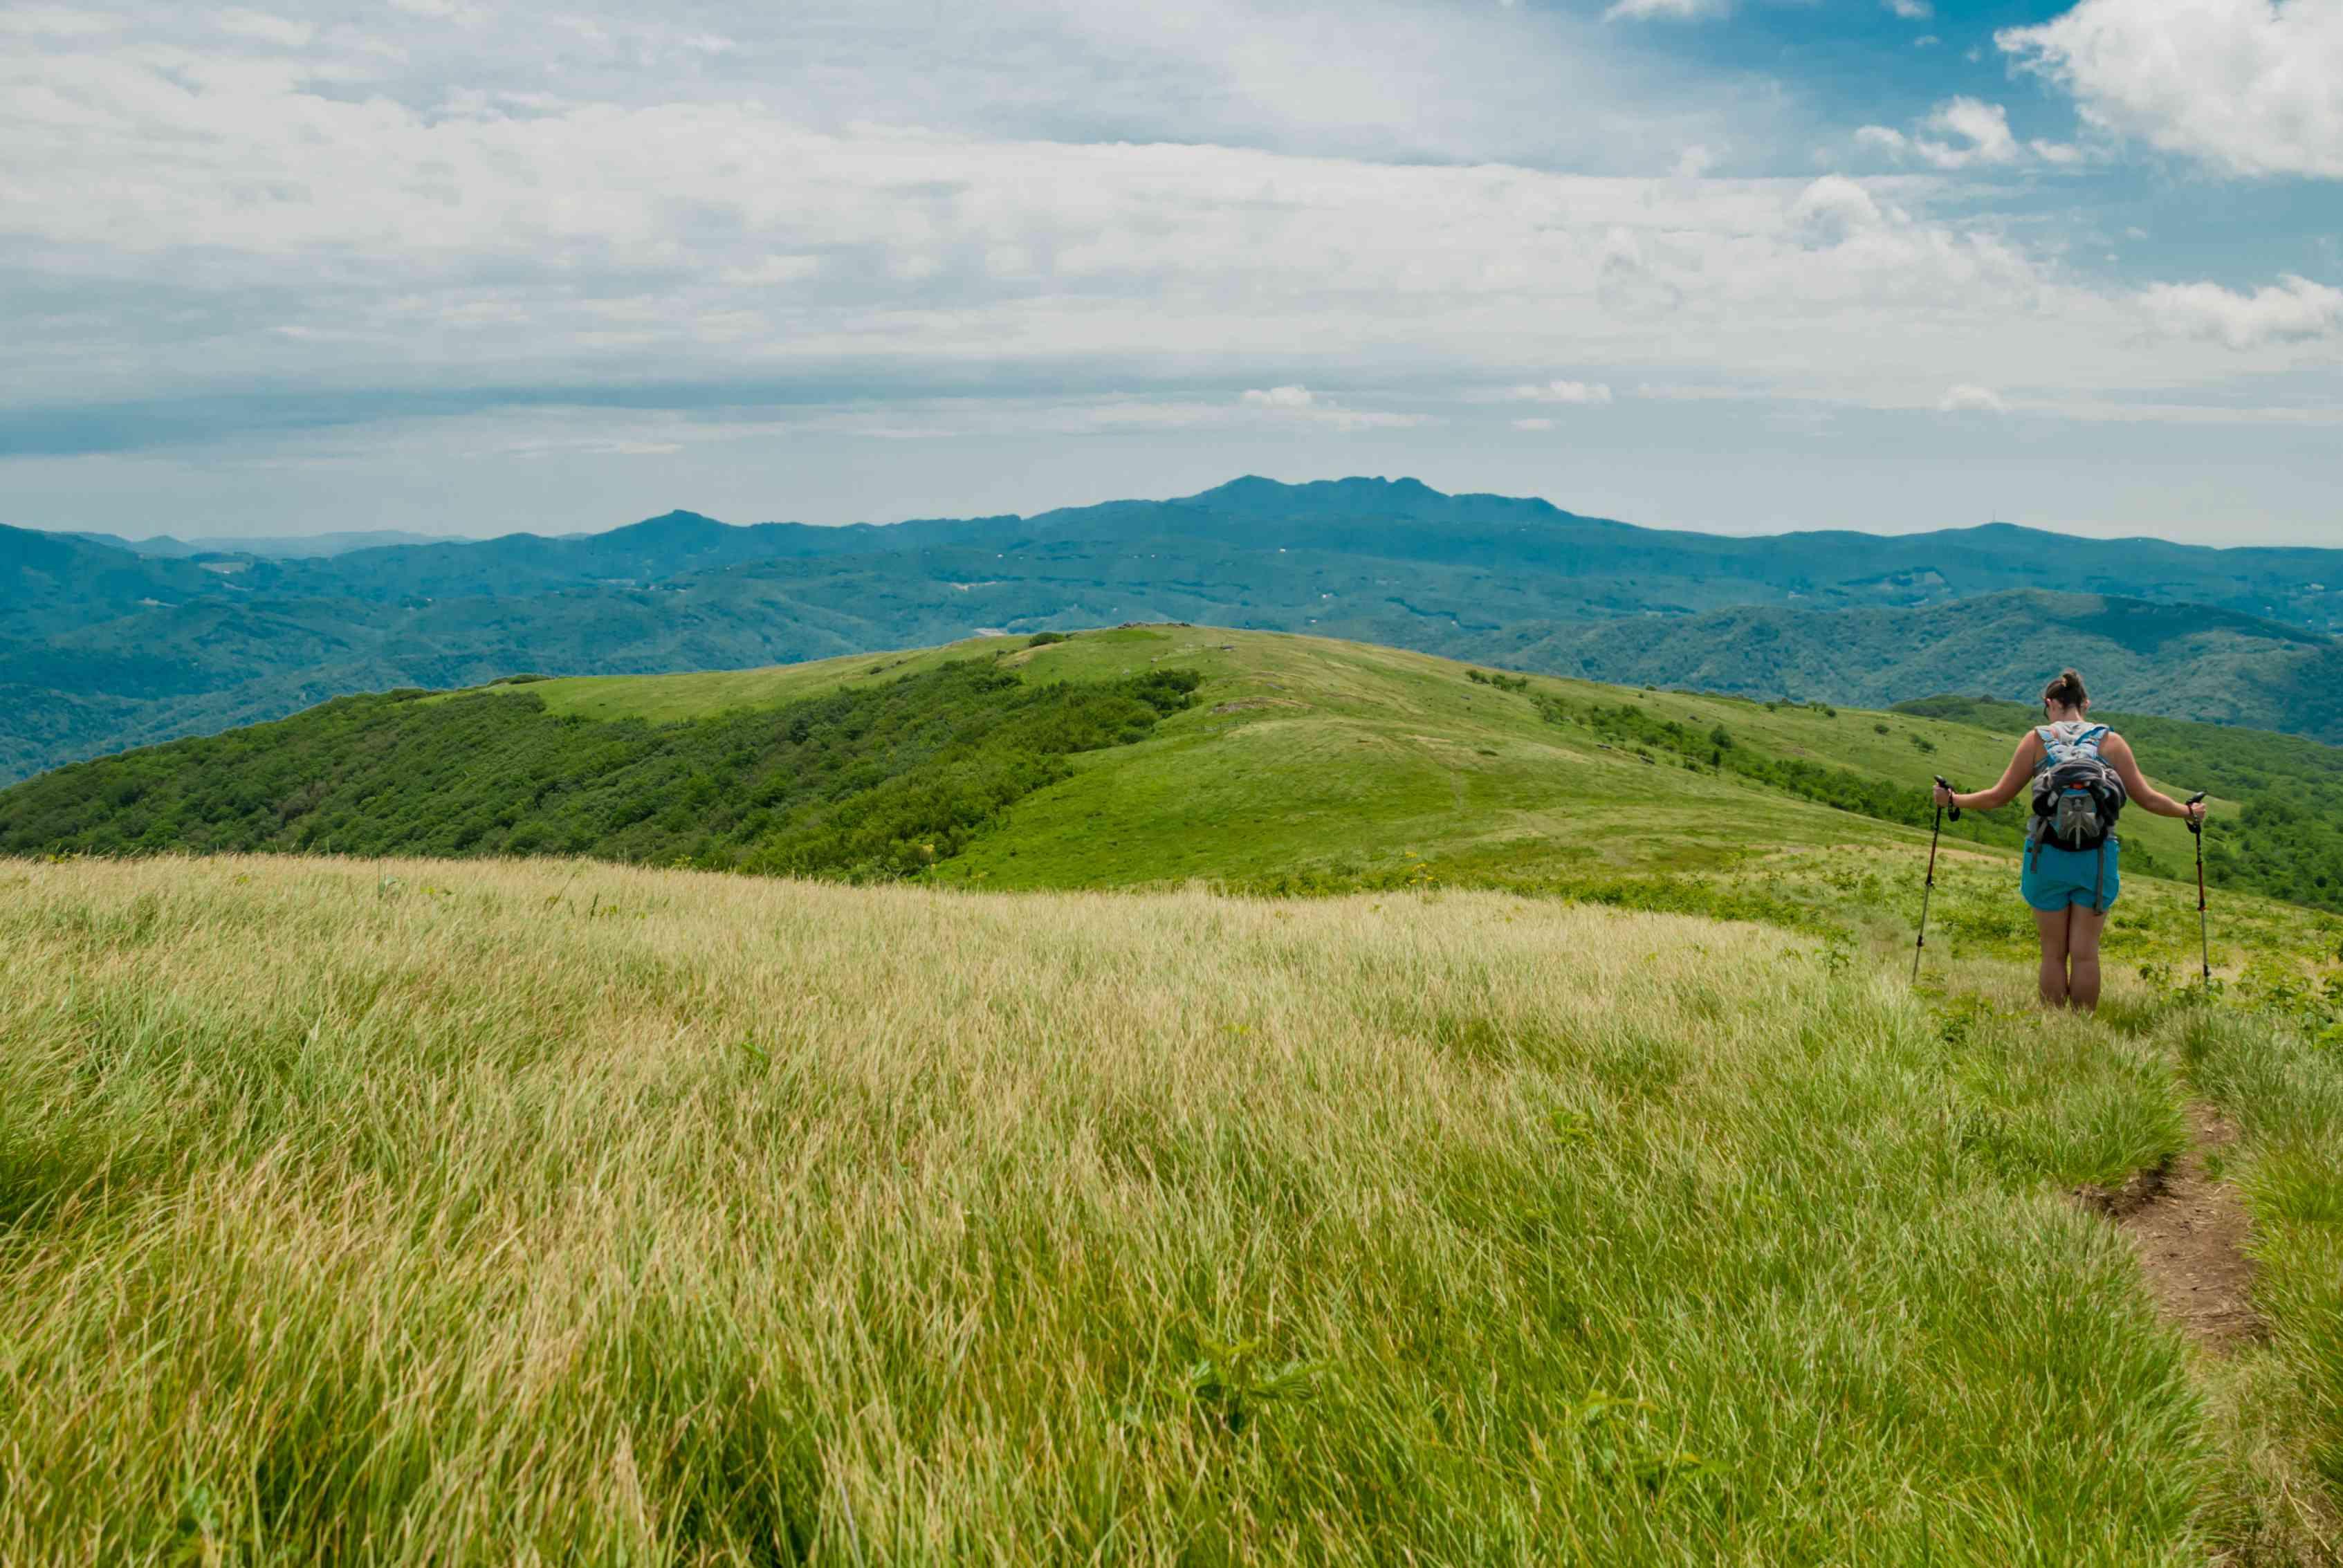 Backcountry in Appalachia